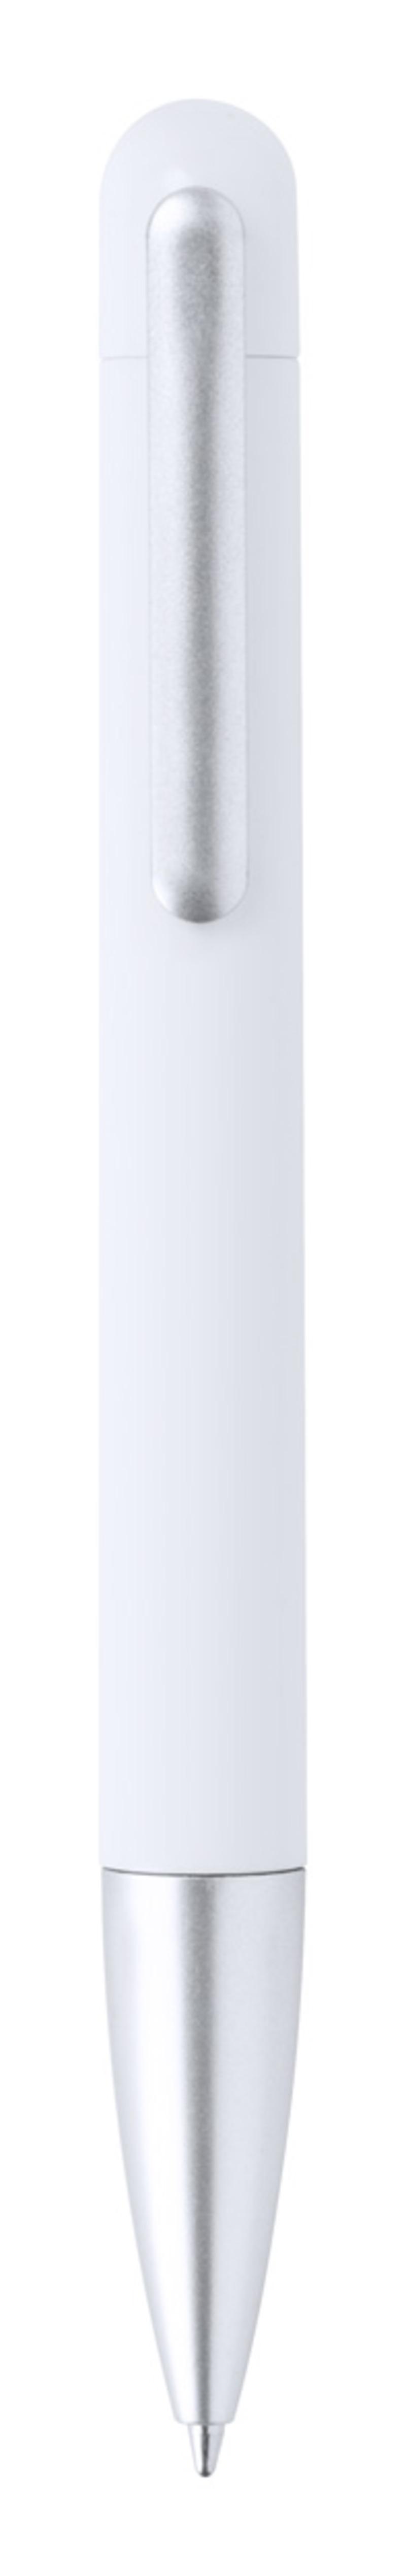 Flixon ballpoint pen